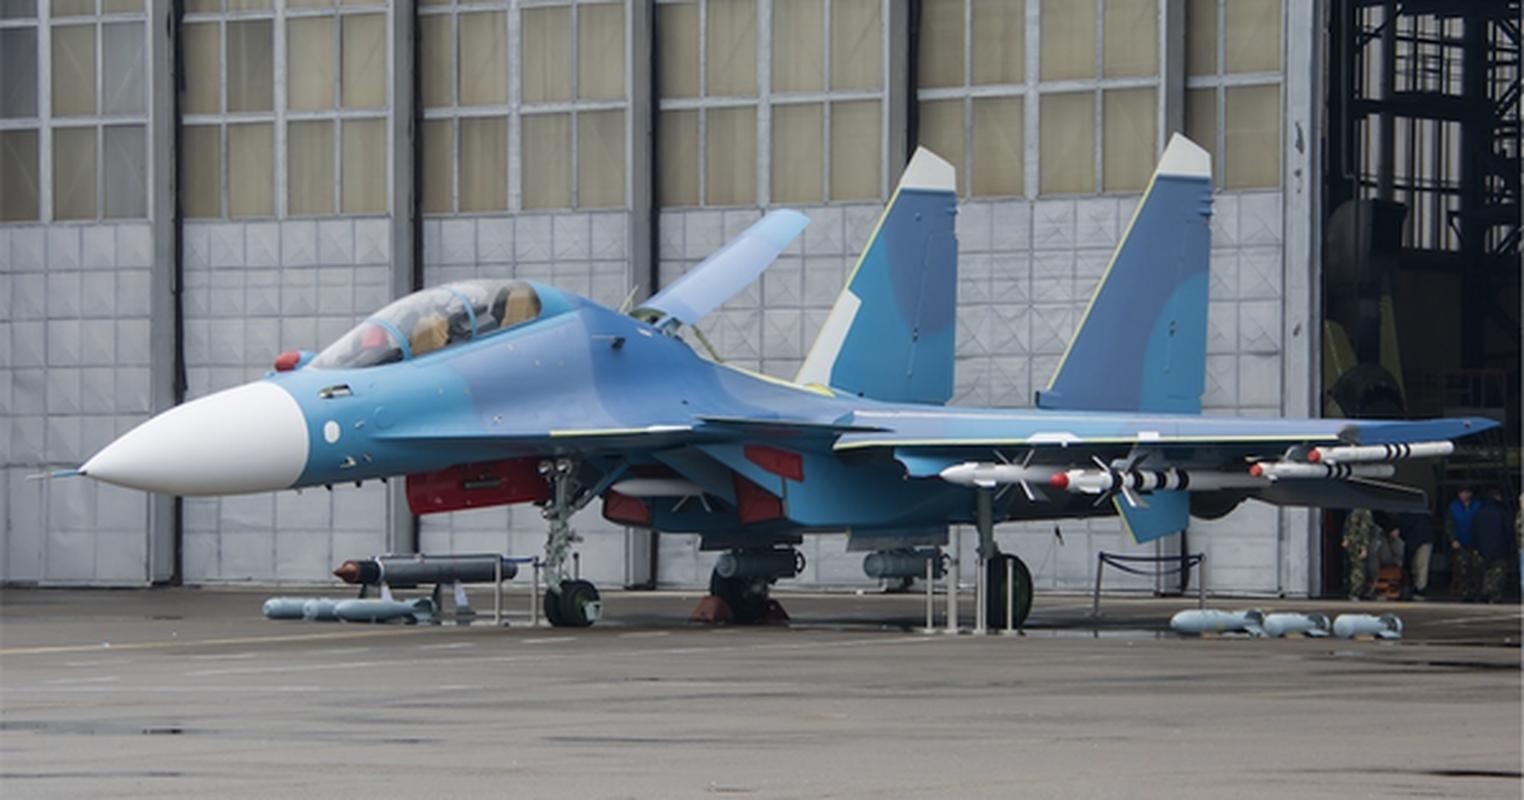 Nga van can man nang cap du tiem kich Su-30SM da qua manh-Hinh-12